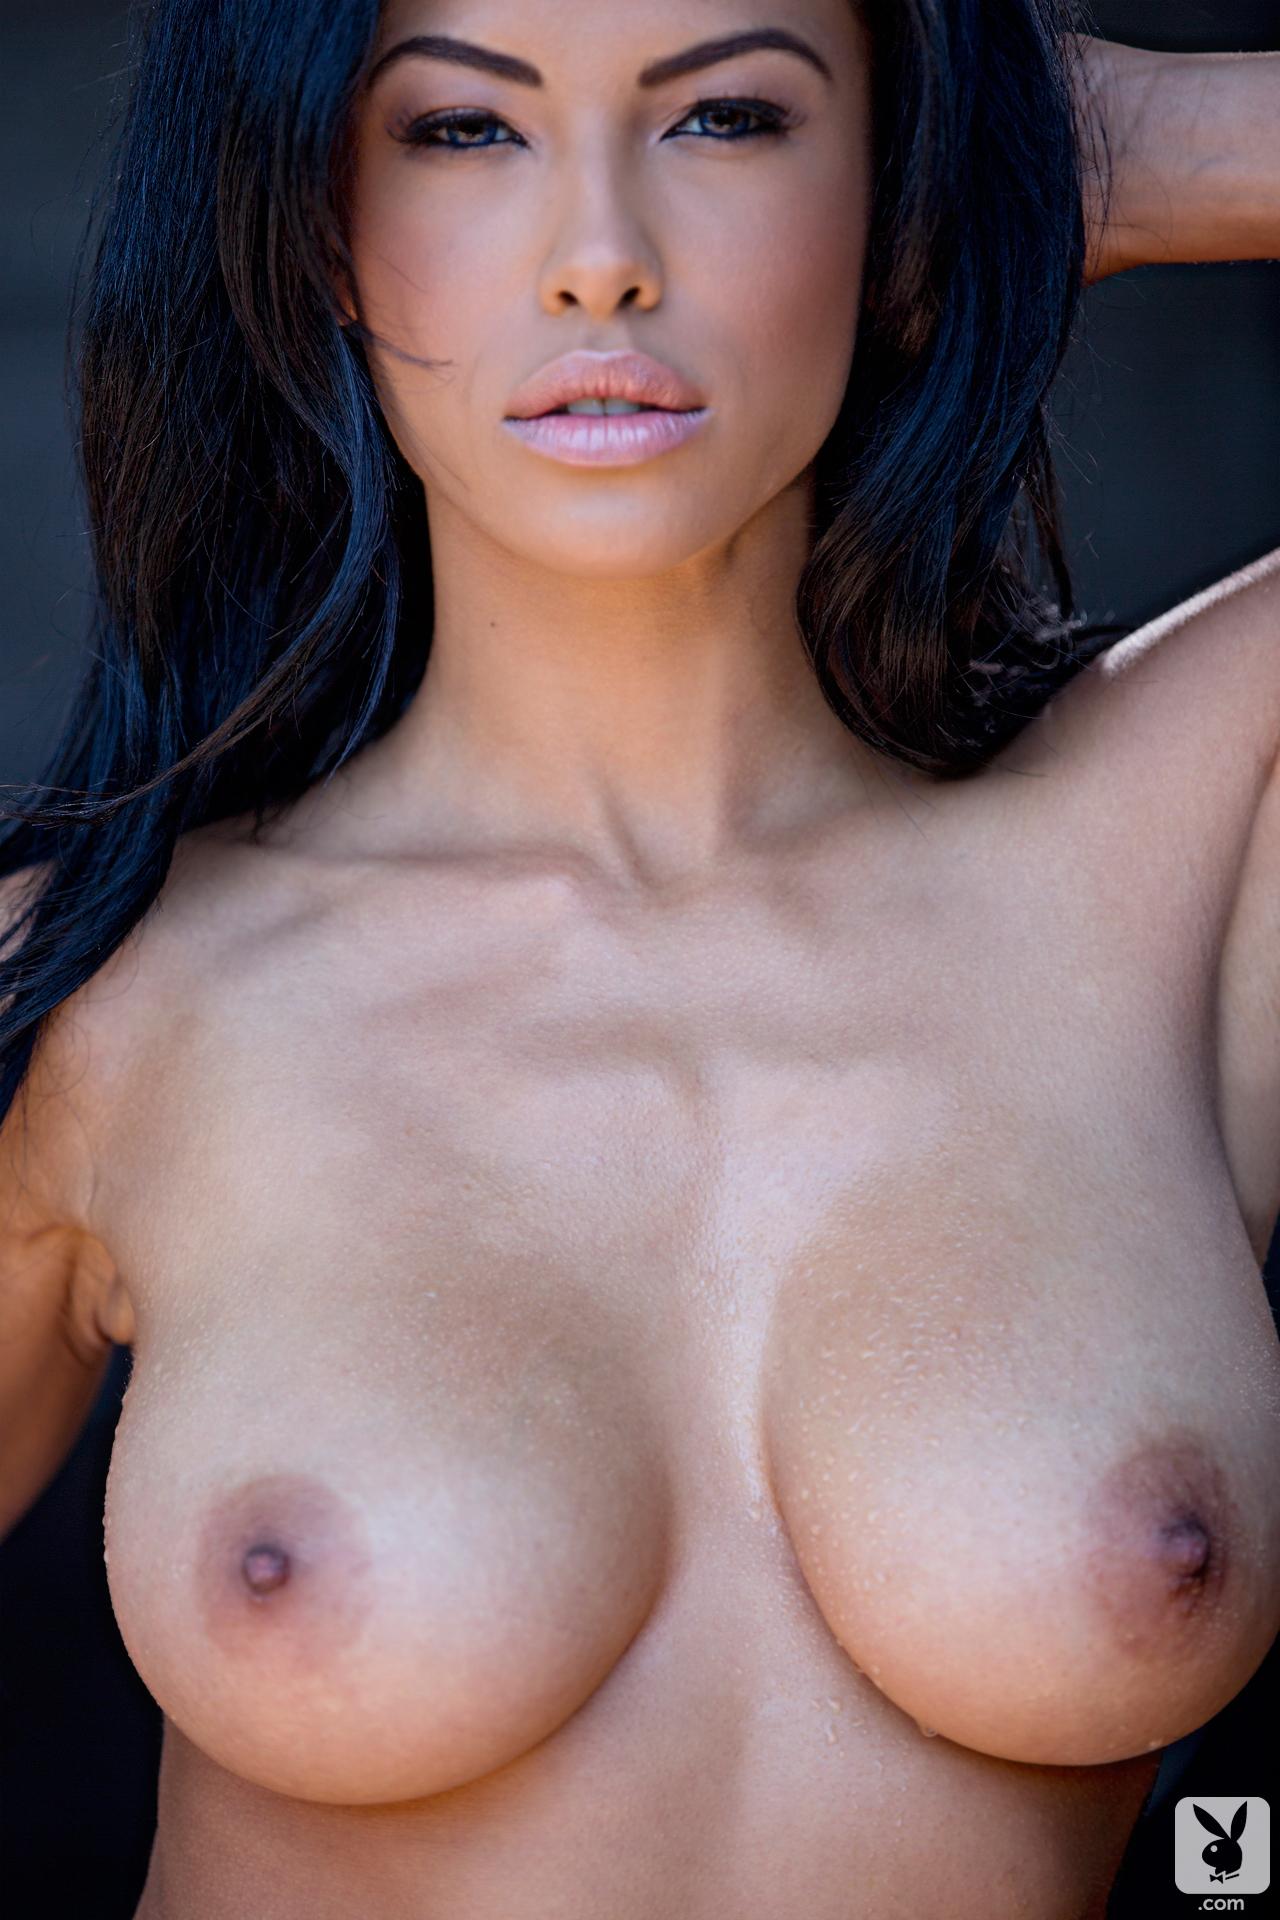 kylie-johnson-brunette-nude-bathroom-playboy-18